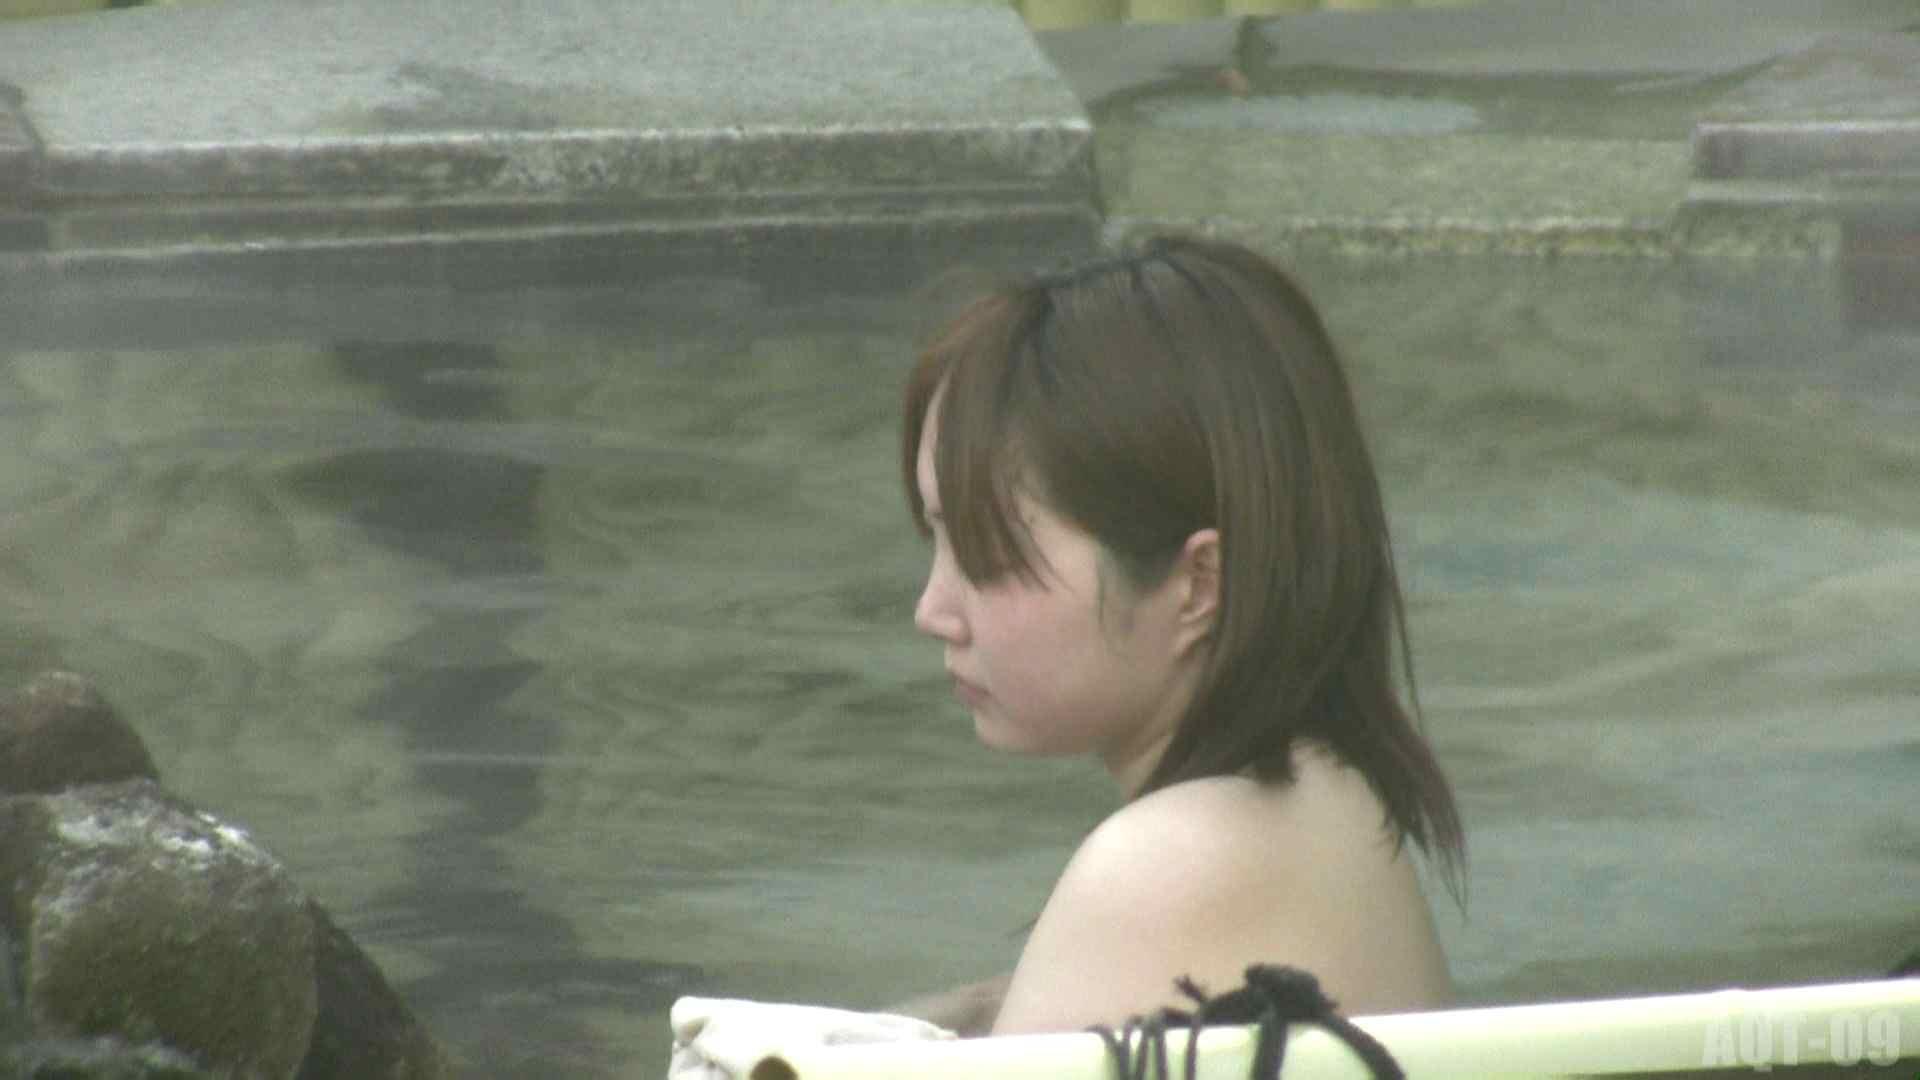 Aquaな露天風呂Vol.781 0 | 0  48連発 16